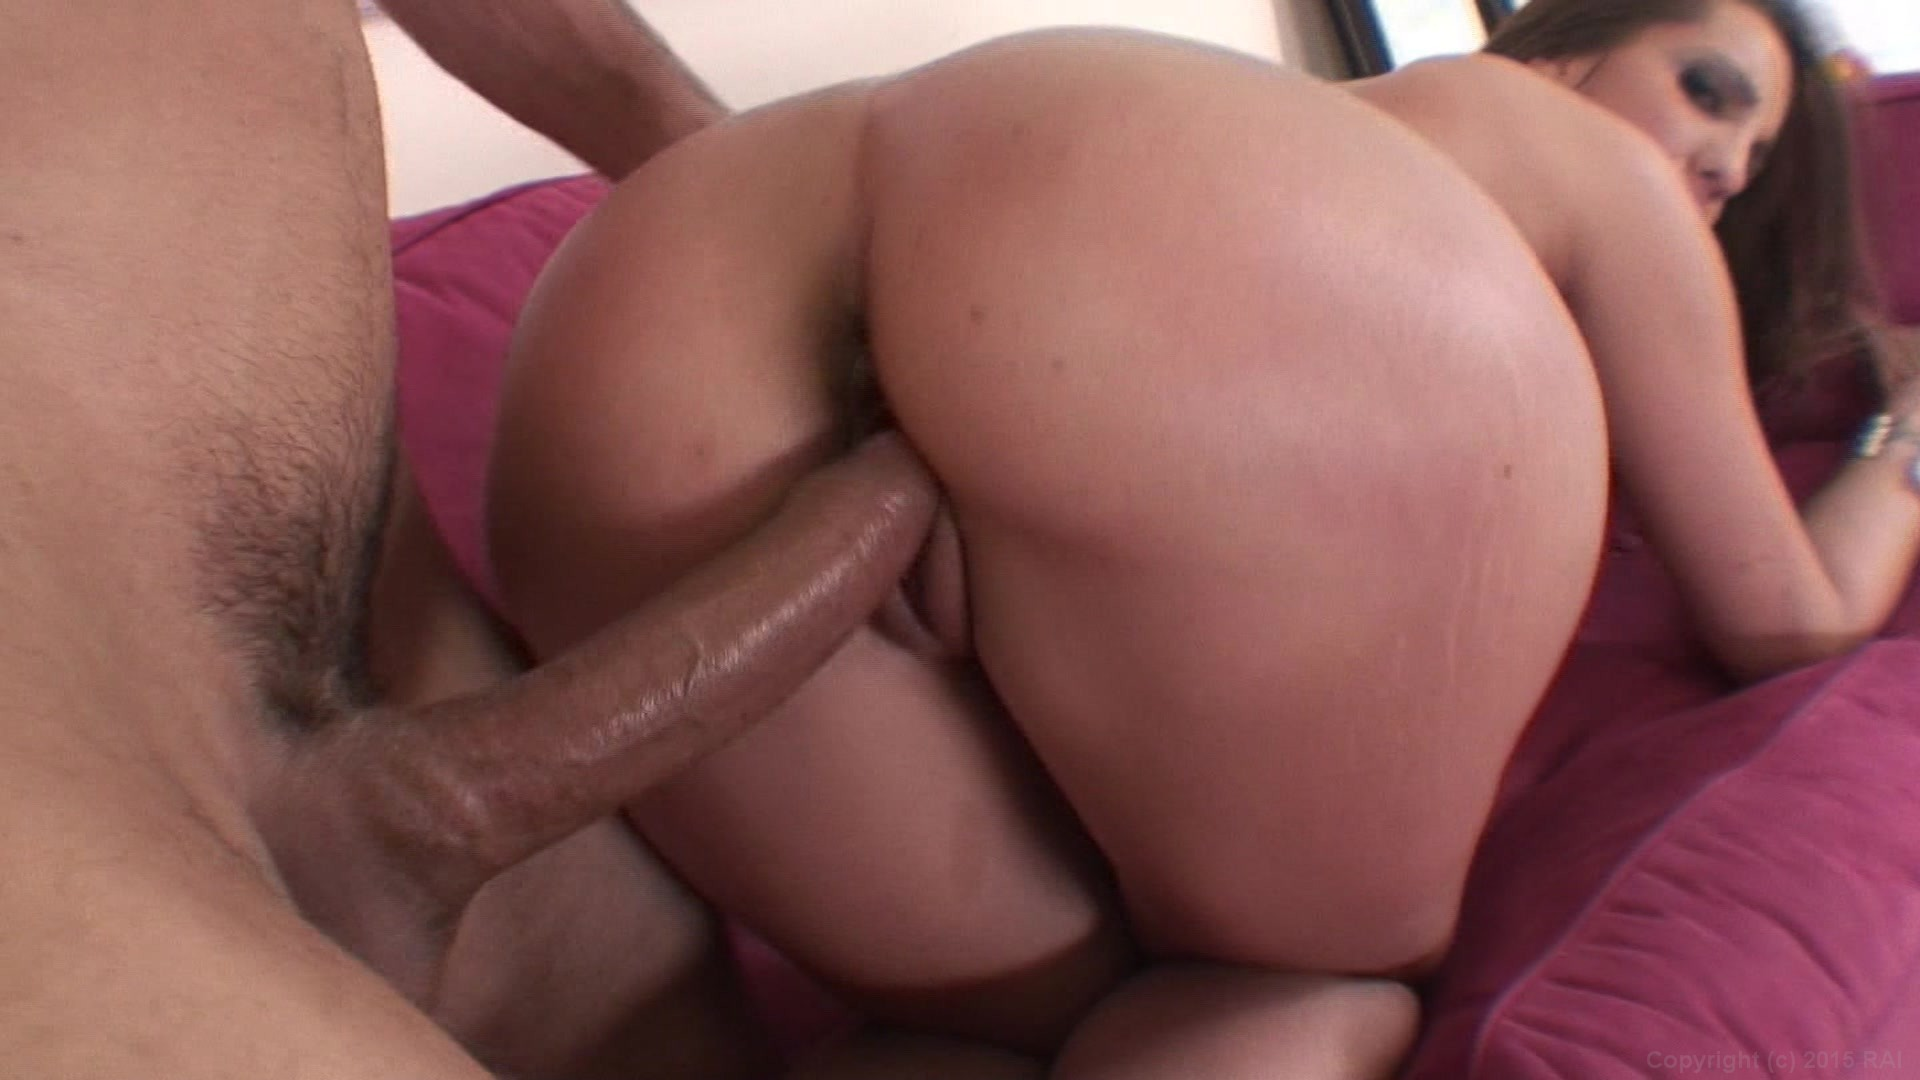 Swallow that big dick